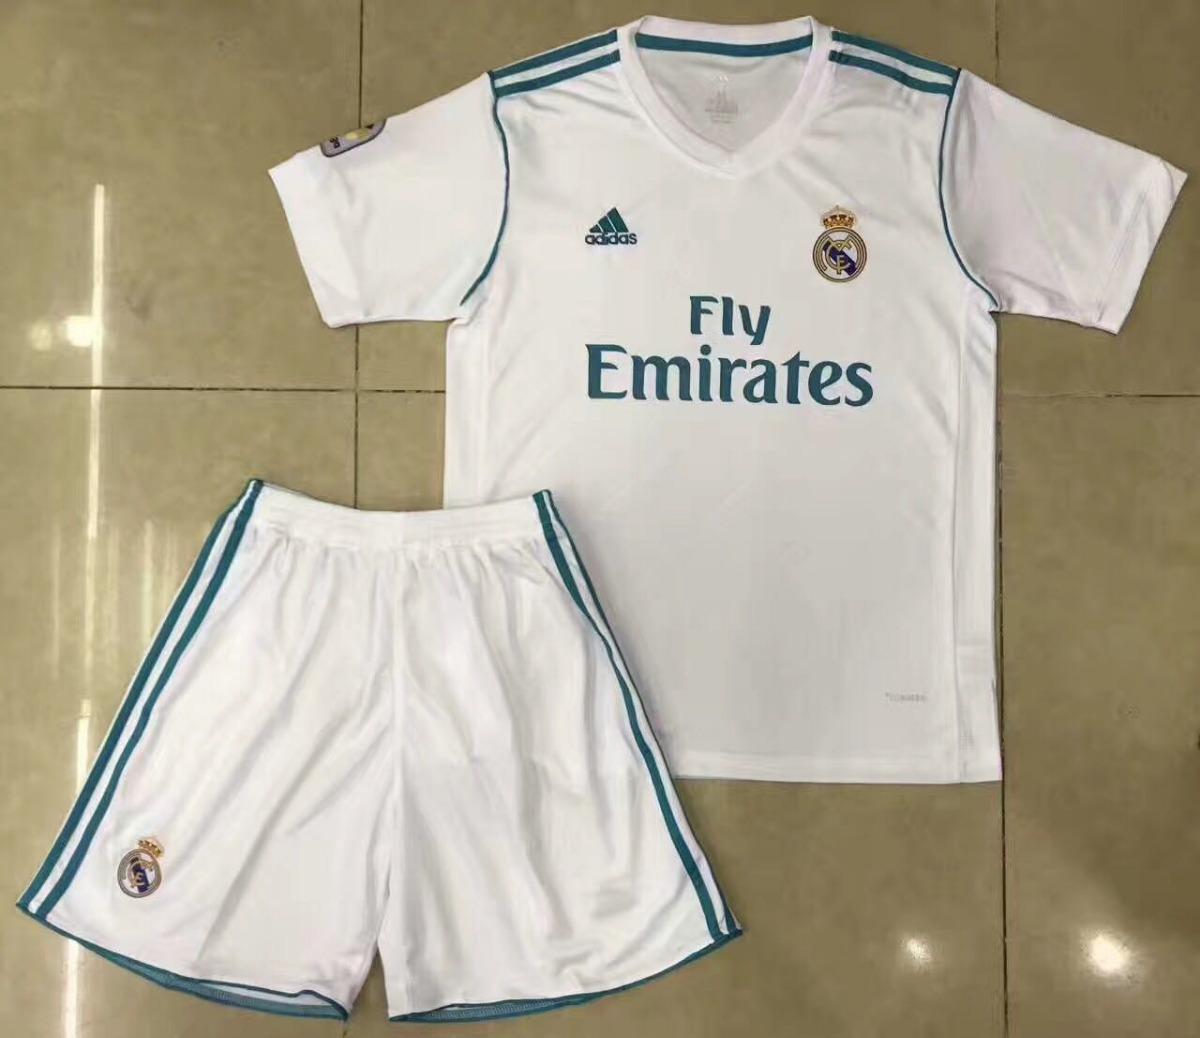 uniforme infantil camisa e shorts real madrid oficial. Carregando zoom. a0ee16312a796